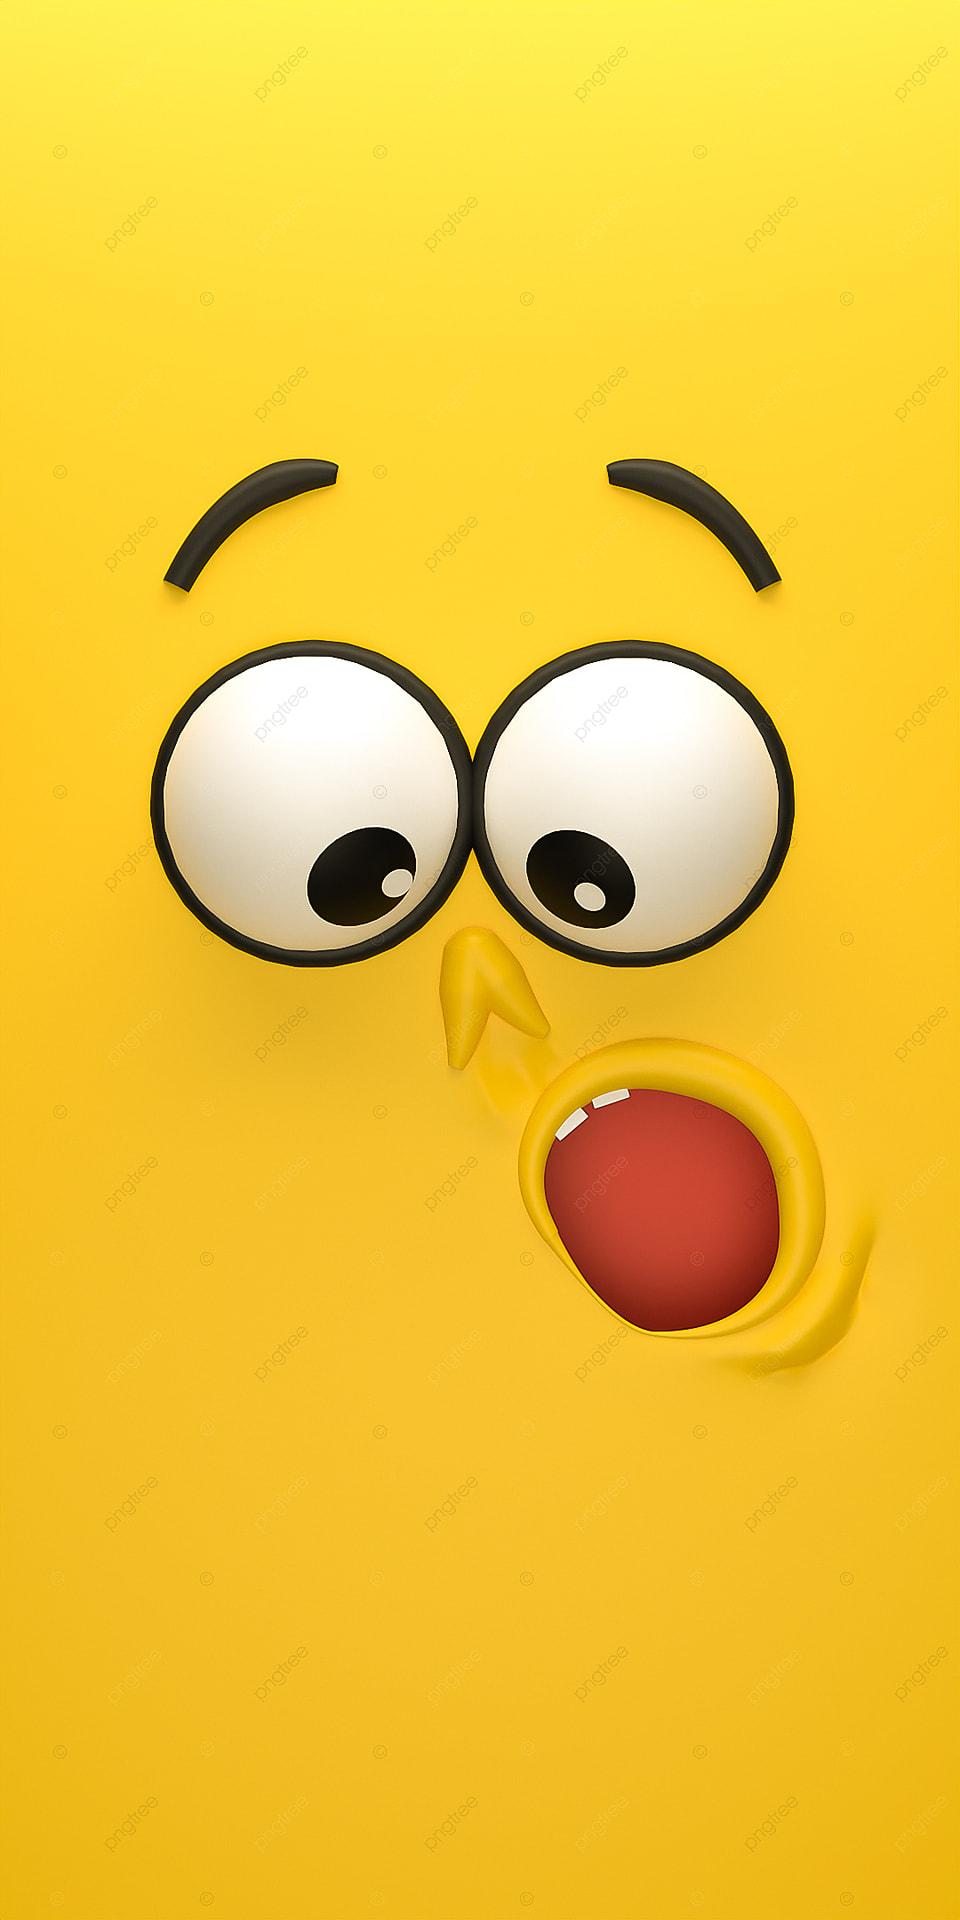 3d Yellow Cartoon Mobile Phone Wallpaper 3d Phone Wallpaper 960x1920